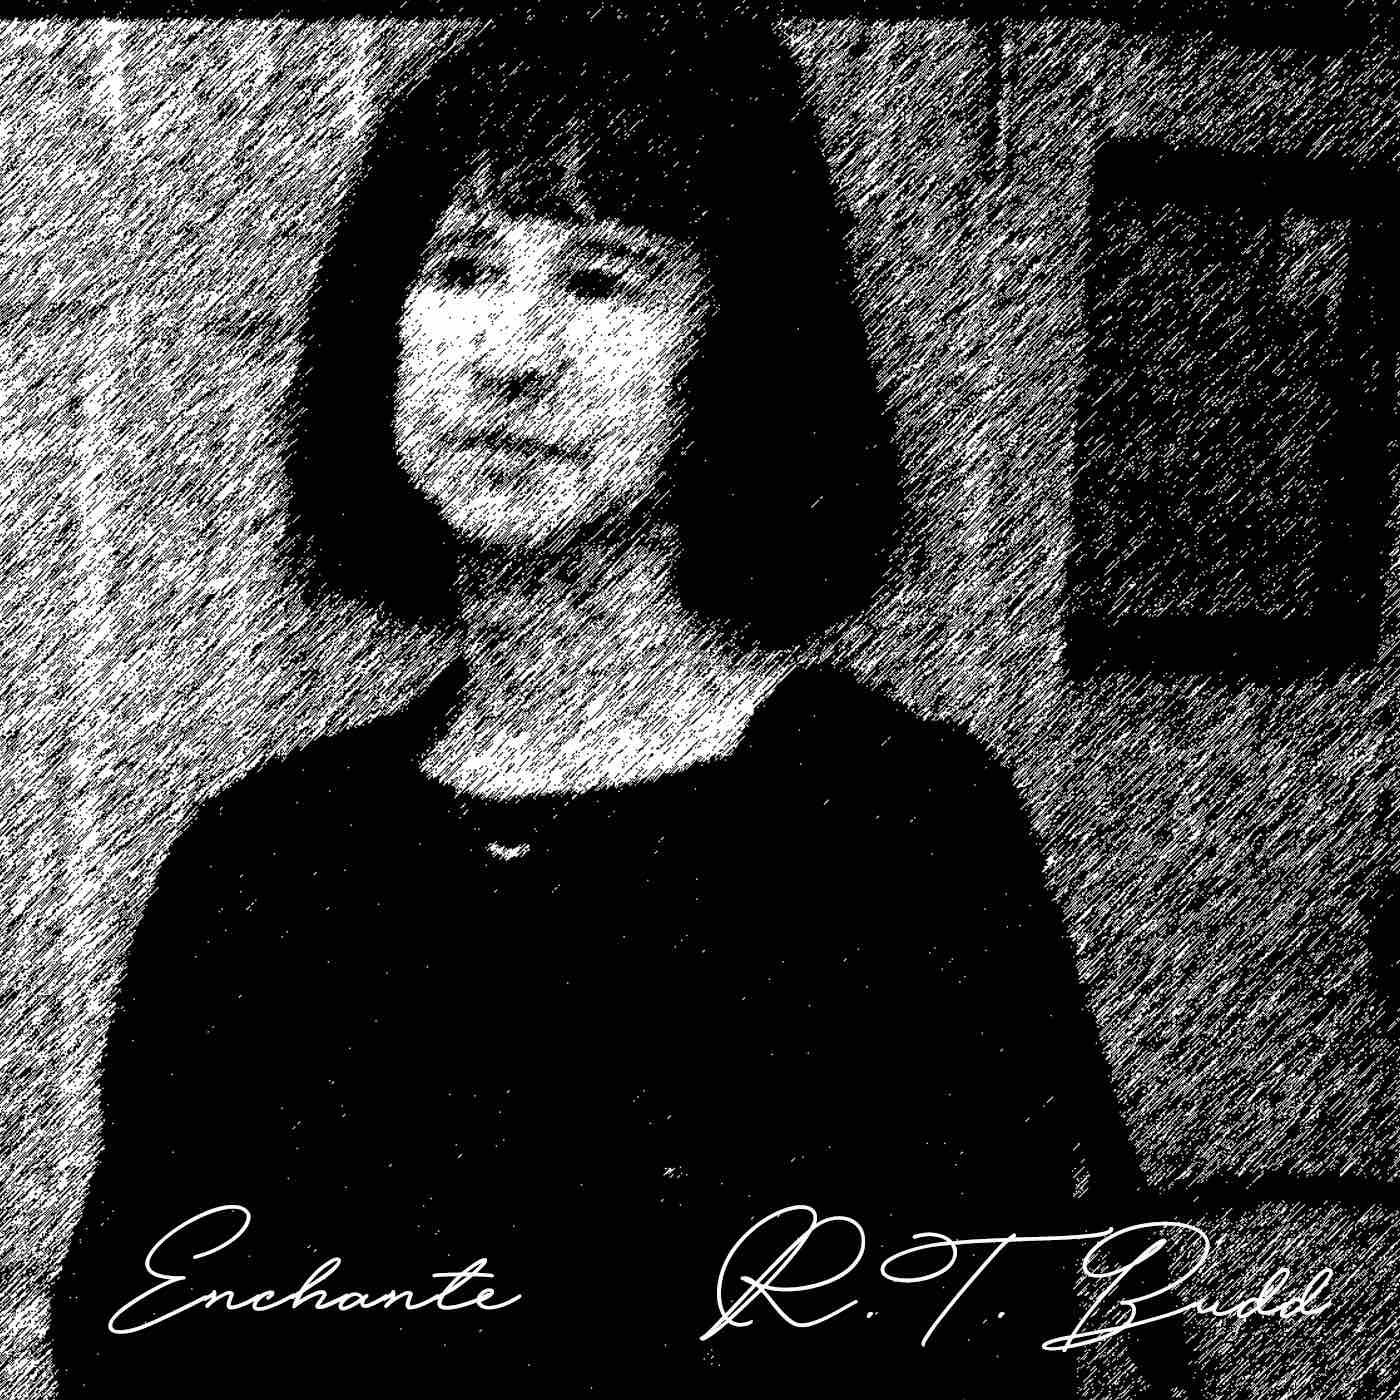 Enchante-RT-Budd